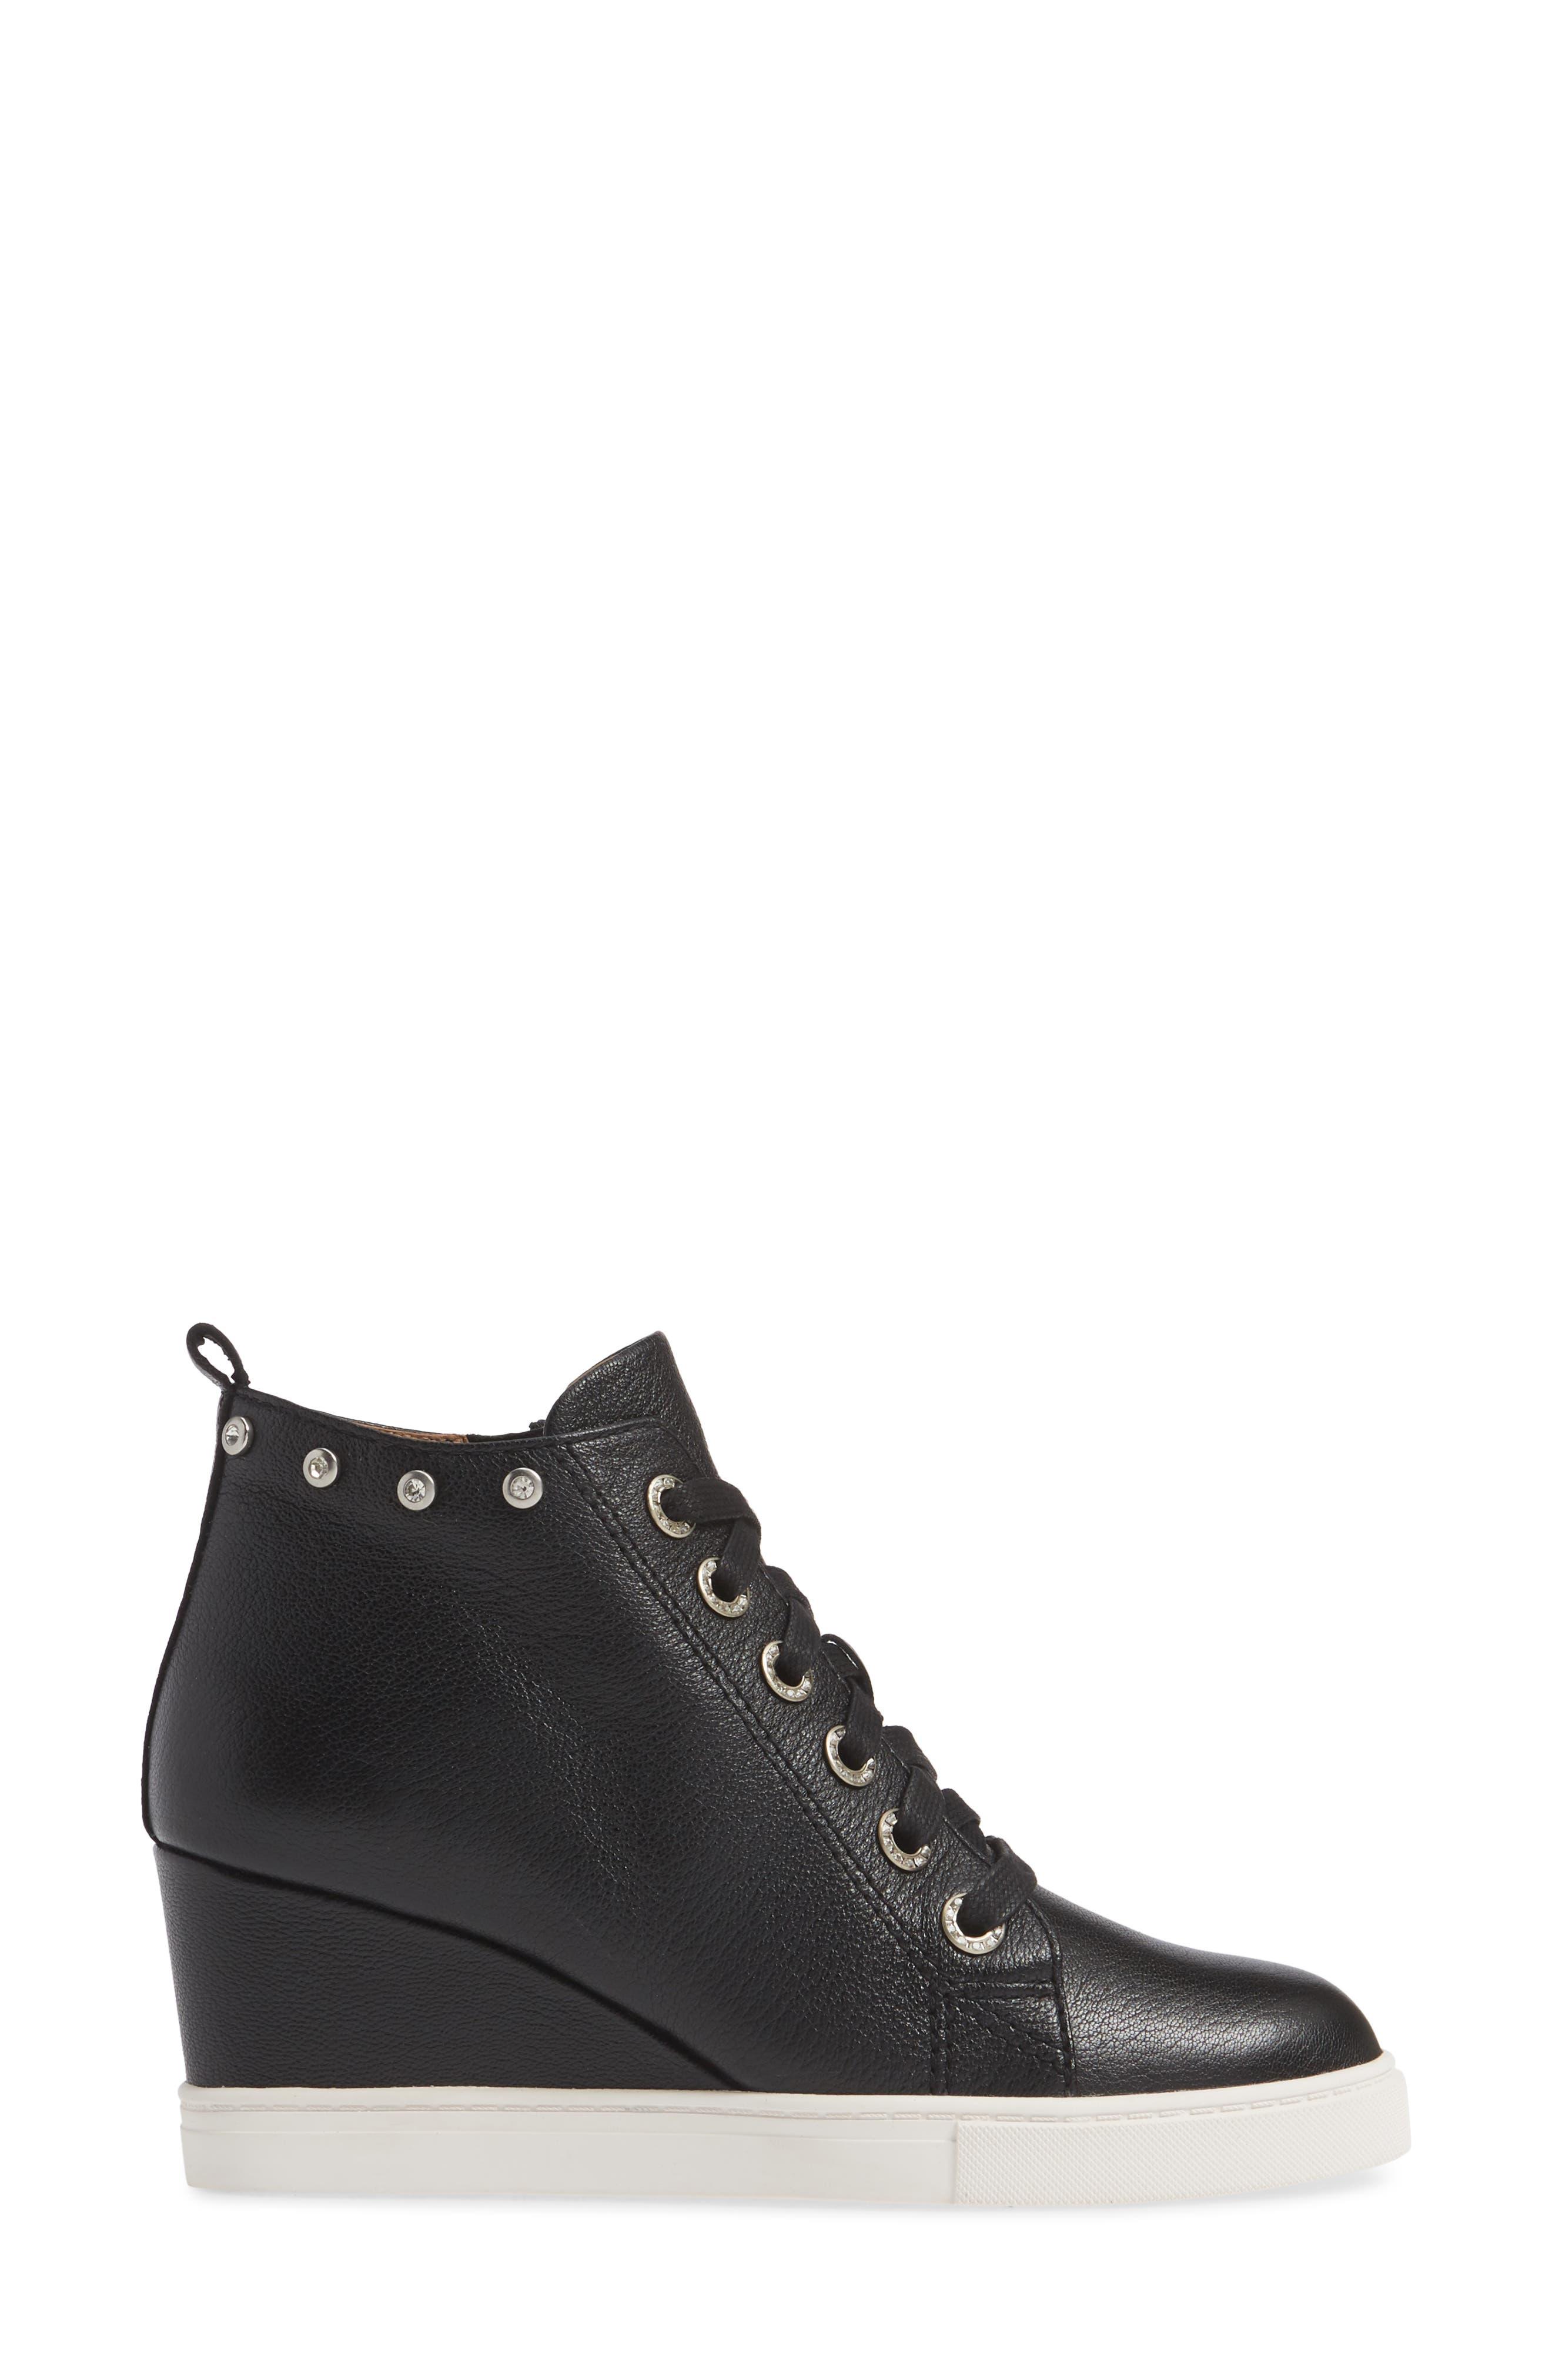 LINEA PAOLO, Flint Wedge Sneaker, Alternate thumbnail 3, color, BLACK LEATHER